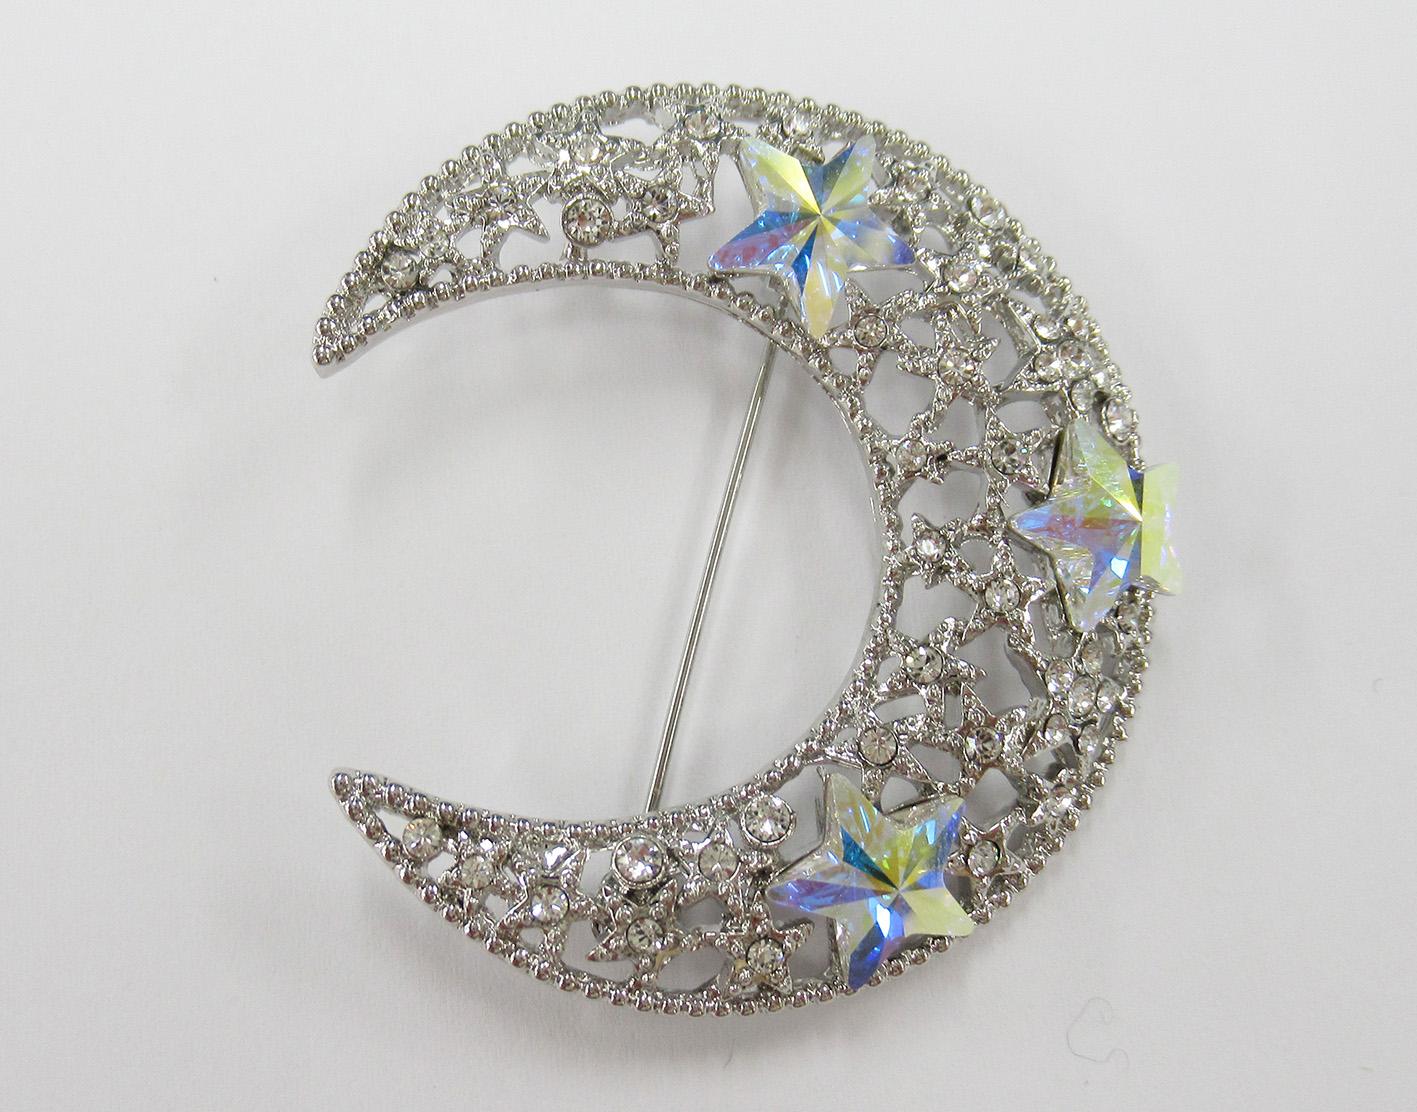 JN クリスタルガラス ムーンクリスタル ブローチ